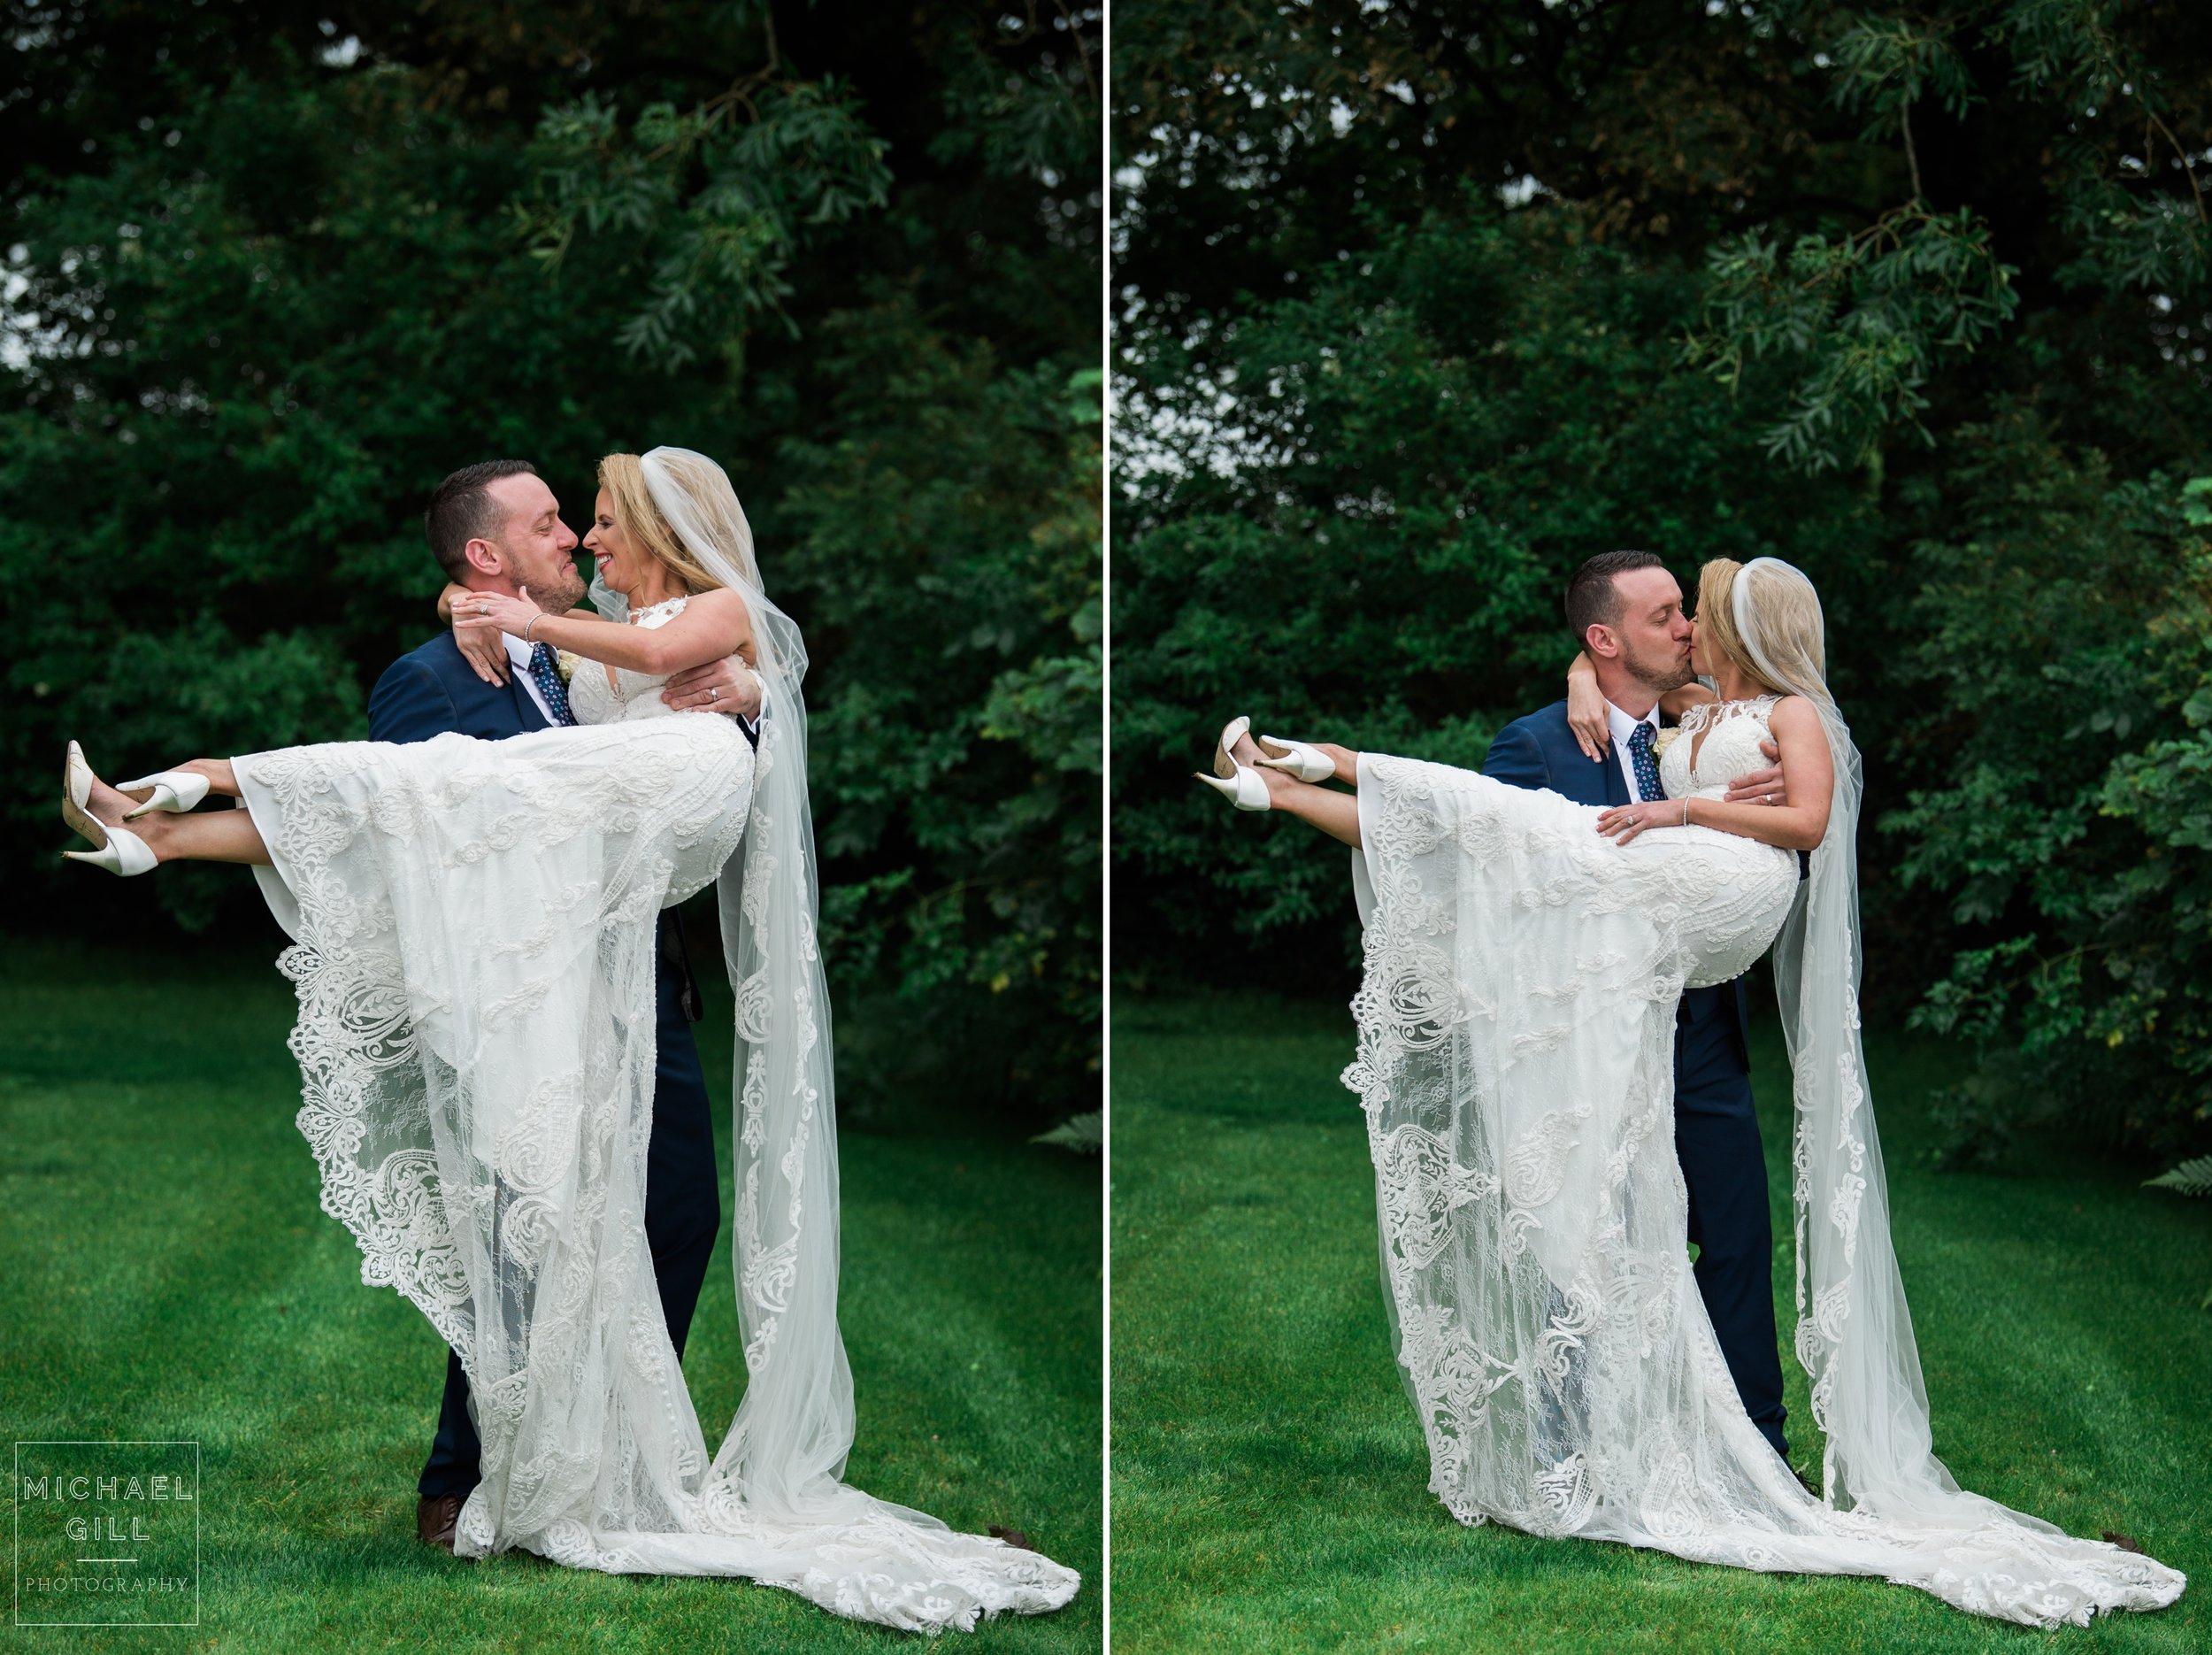 Michael_Gill_Photography_Wedding_Ballyliffin008.JPG